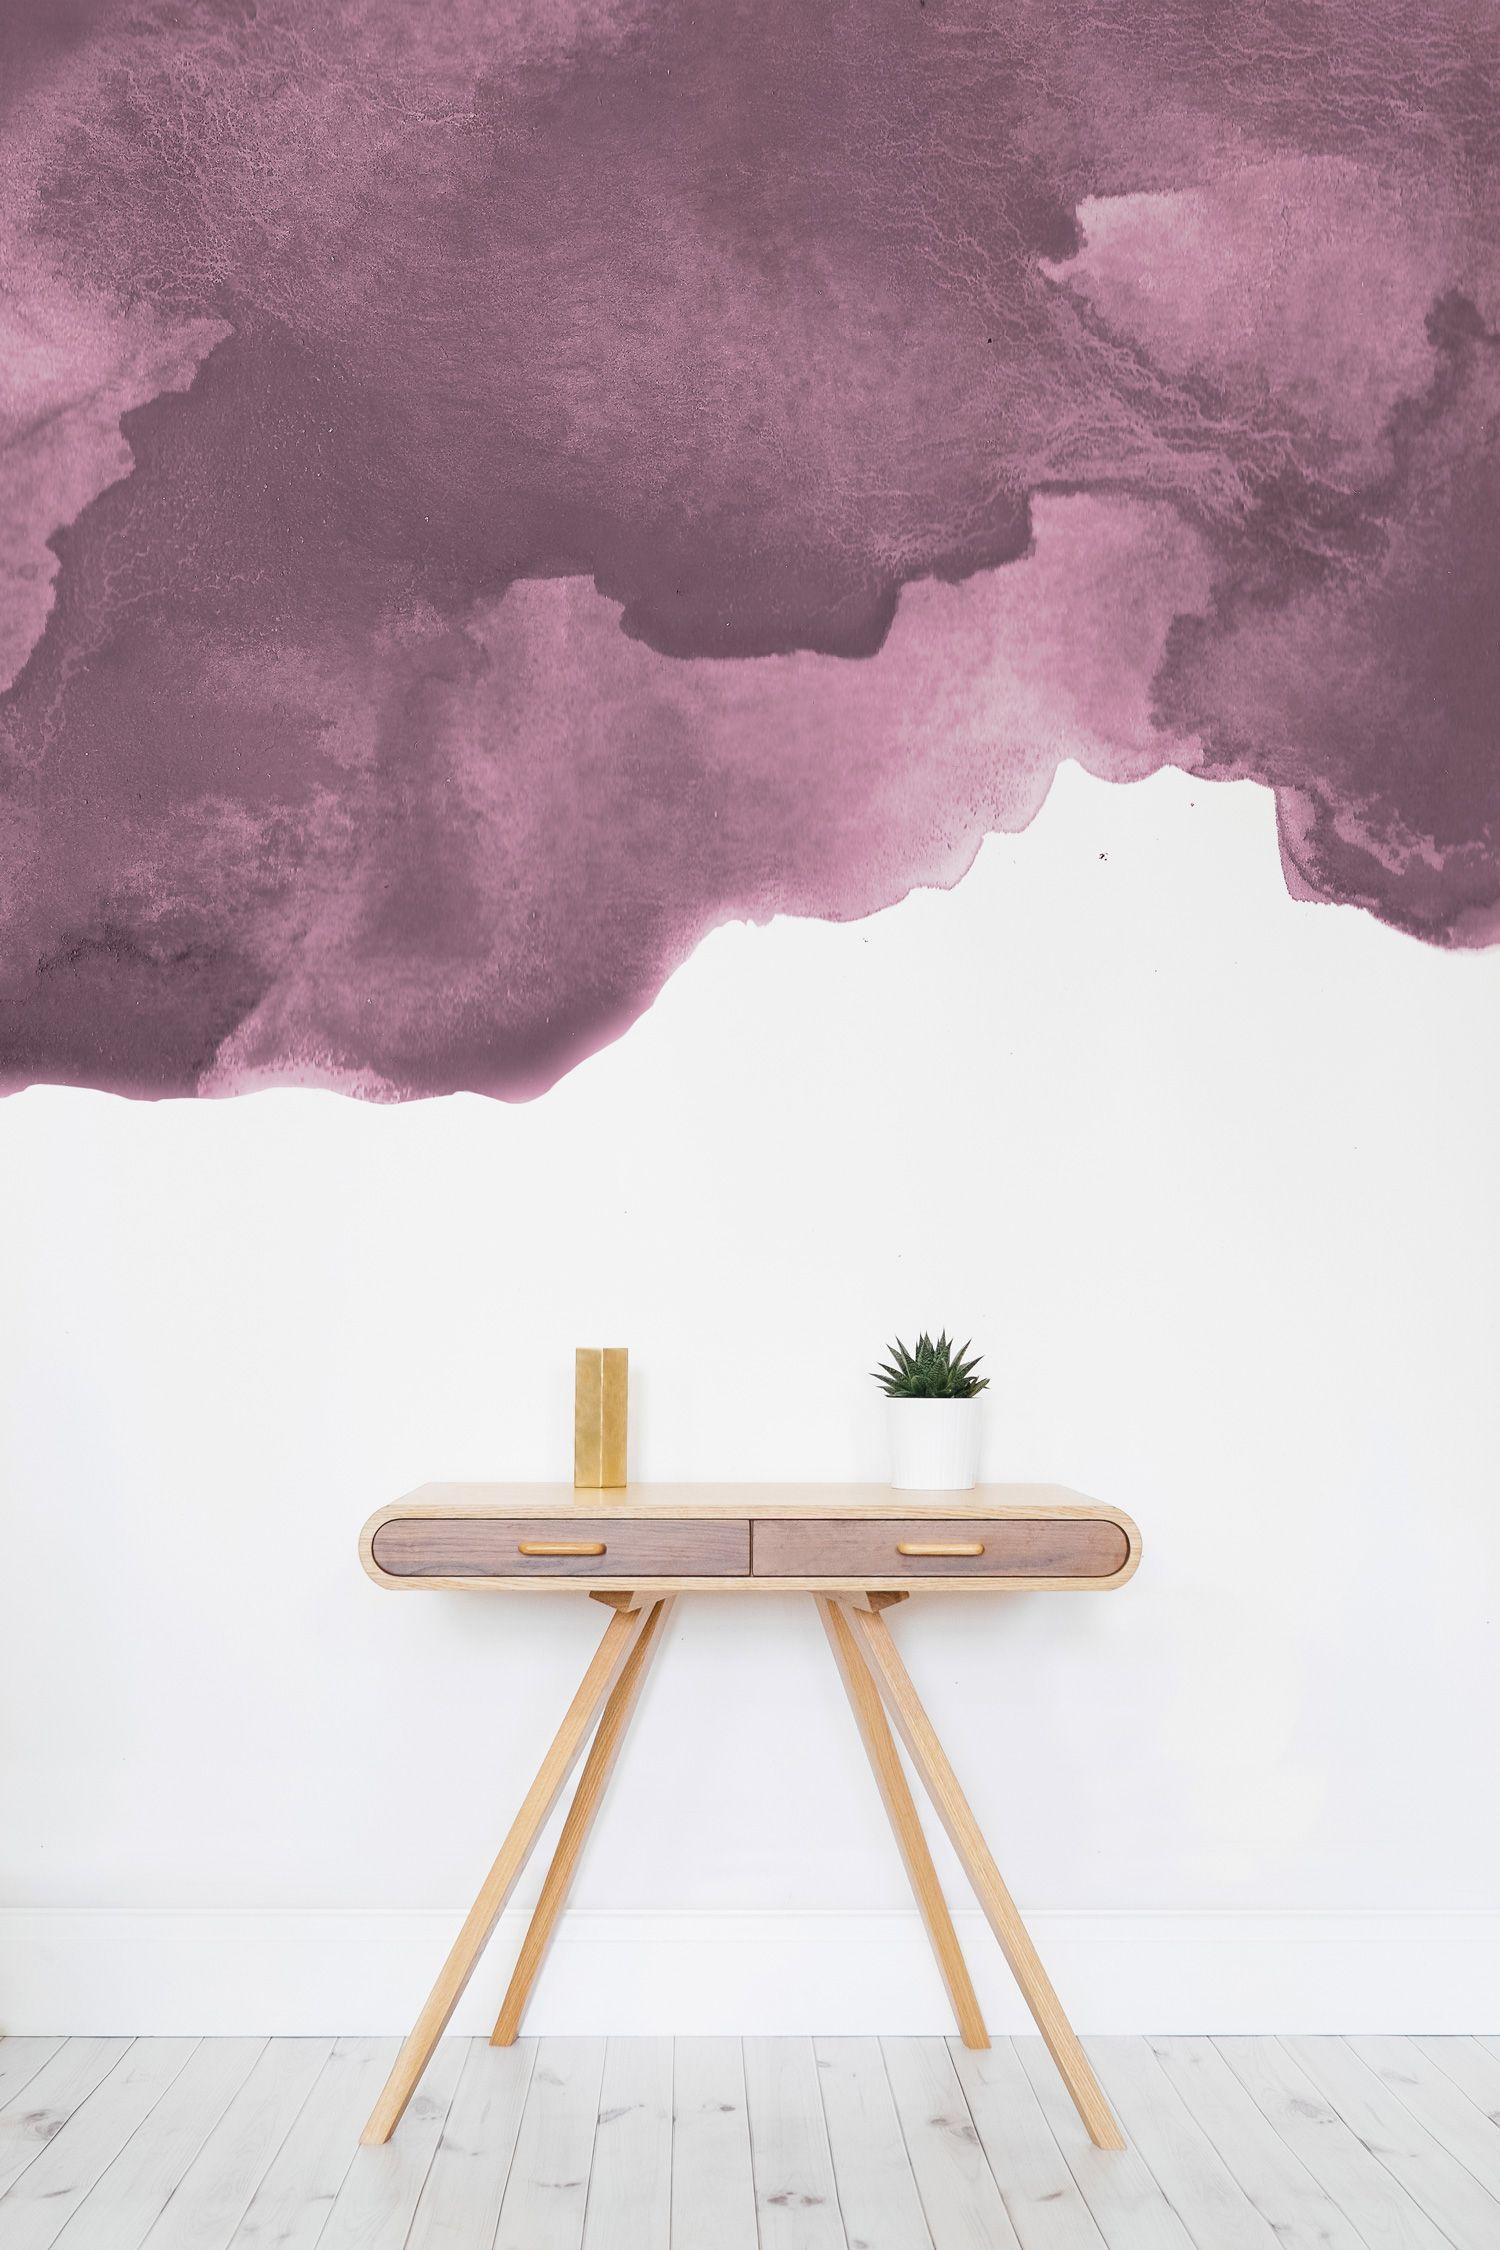 Neue wohnzimmer innenarchitektur pink watercolor wallpaper mural  muralswallpaper  millenial pink